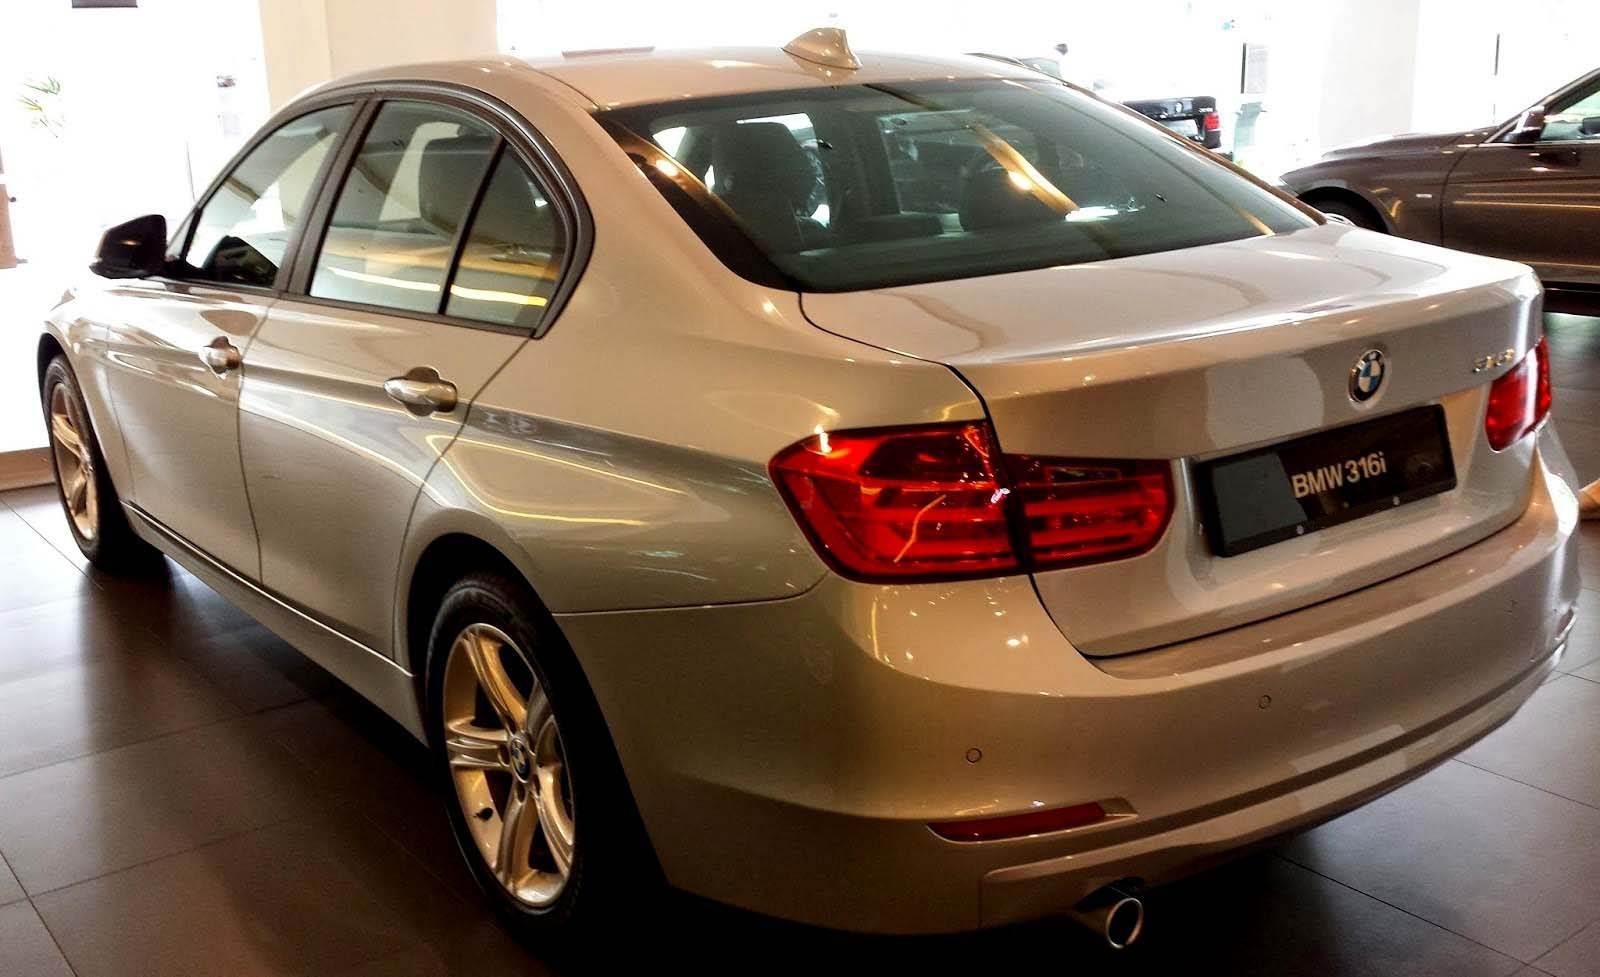 BMW 316i x Audi A4